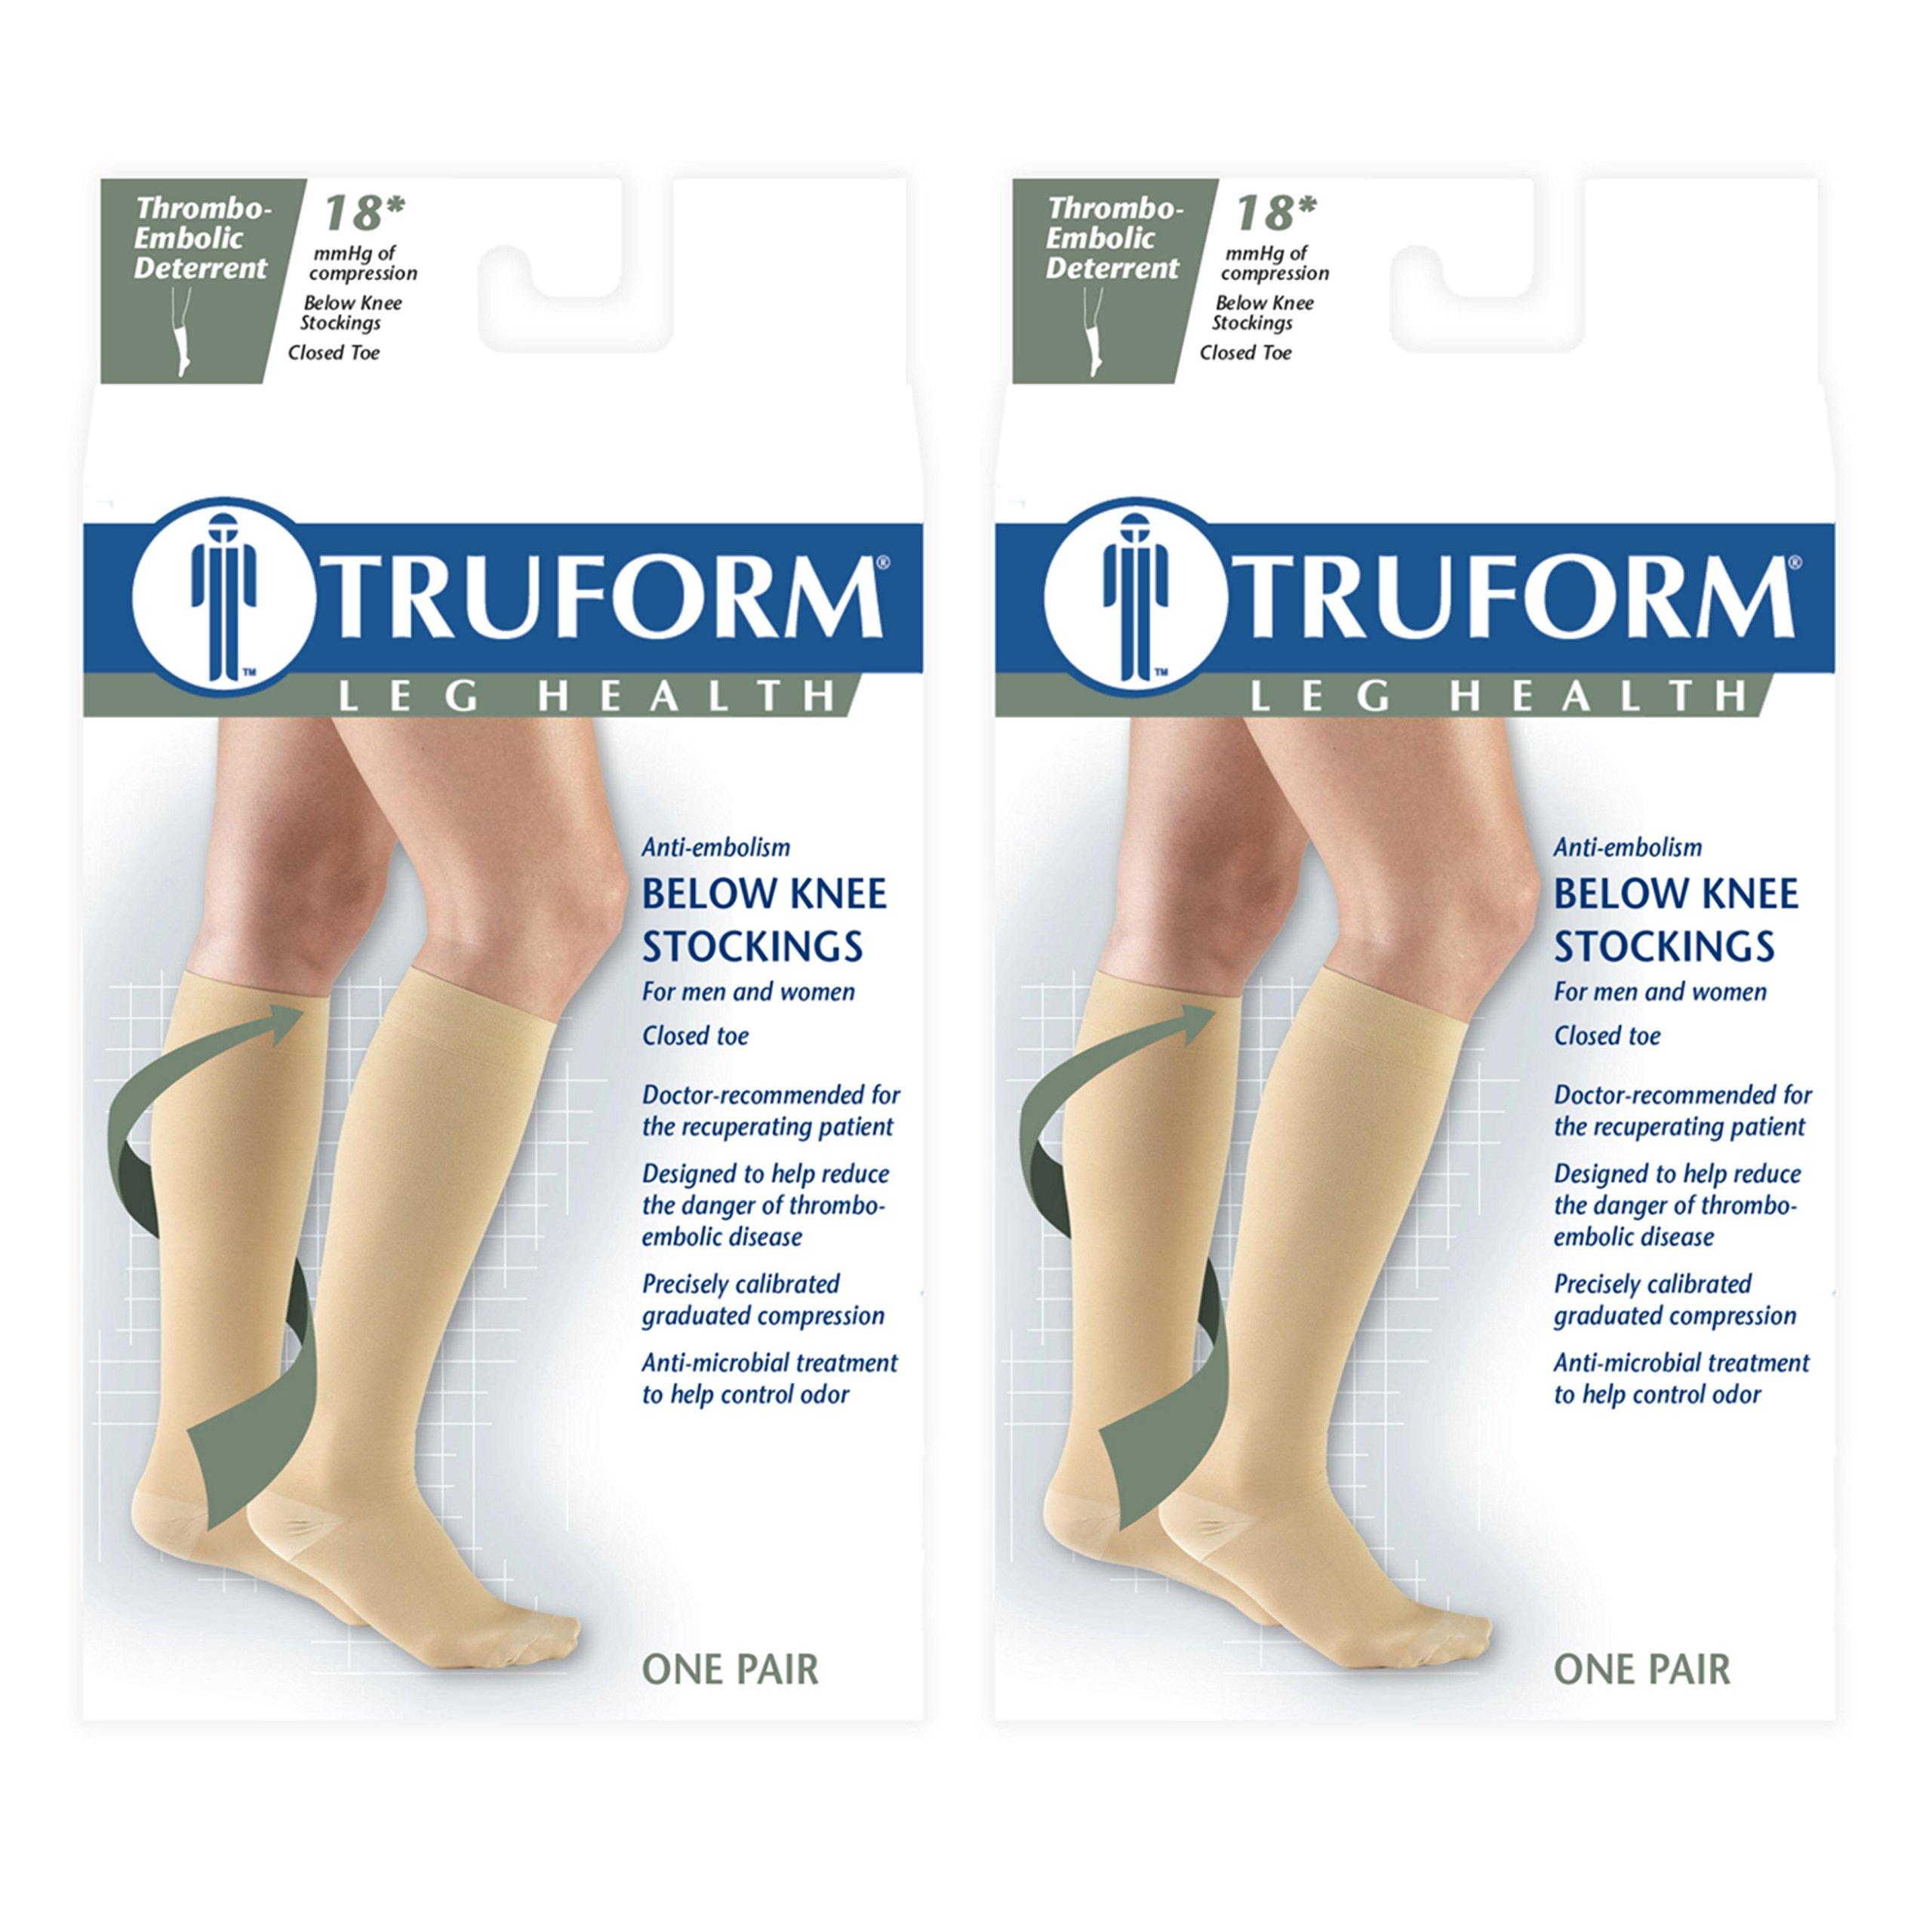 Truform 8808 Anti-Embolism Knee Length Closed Toe 18 mmHg Stockings, Beige, Small (Pack of 2)